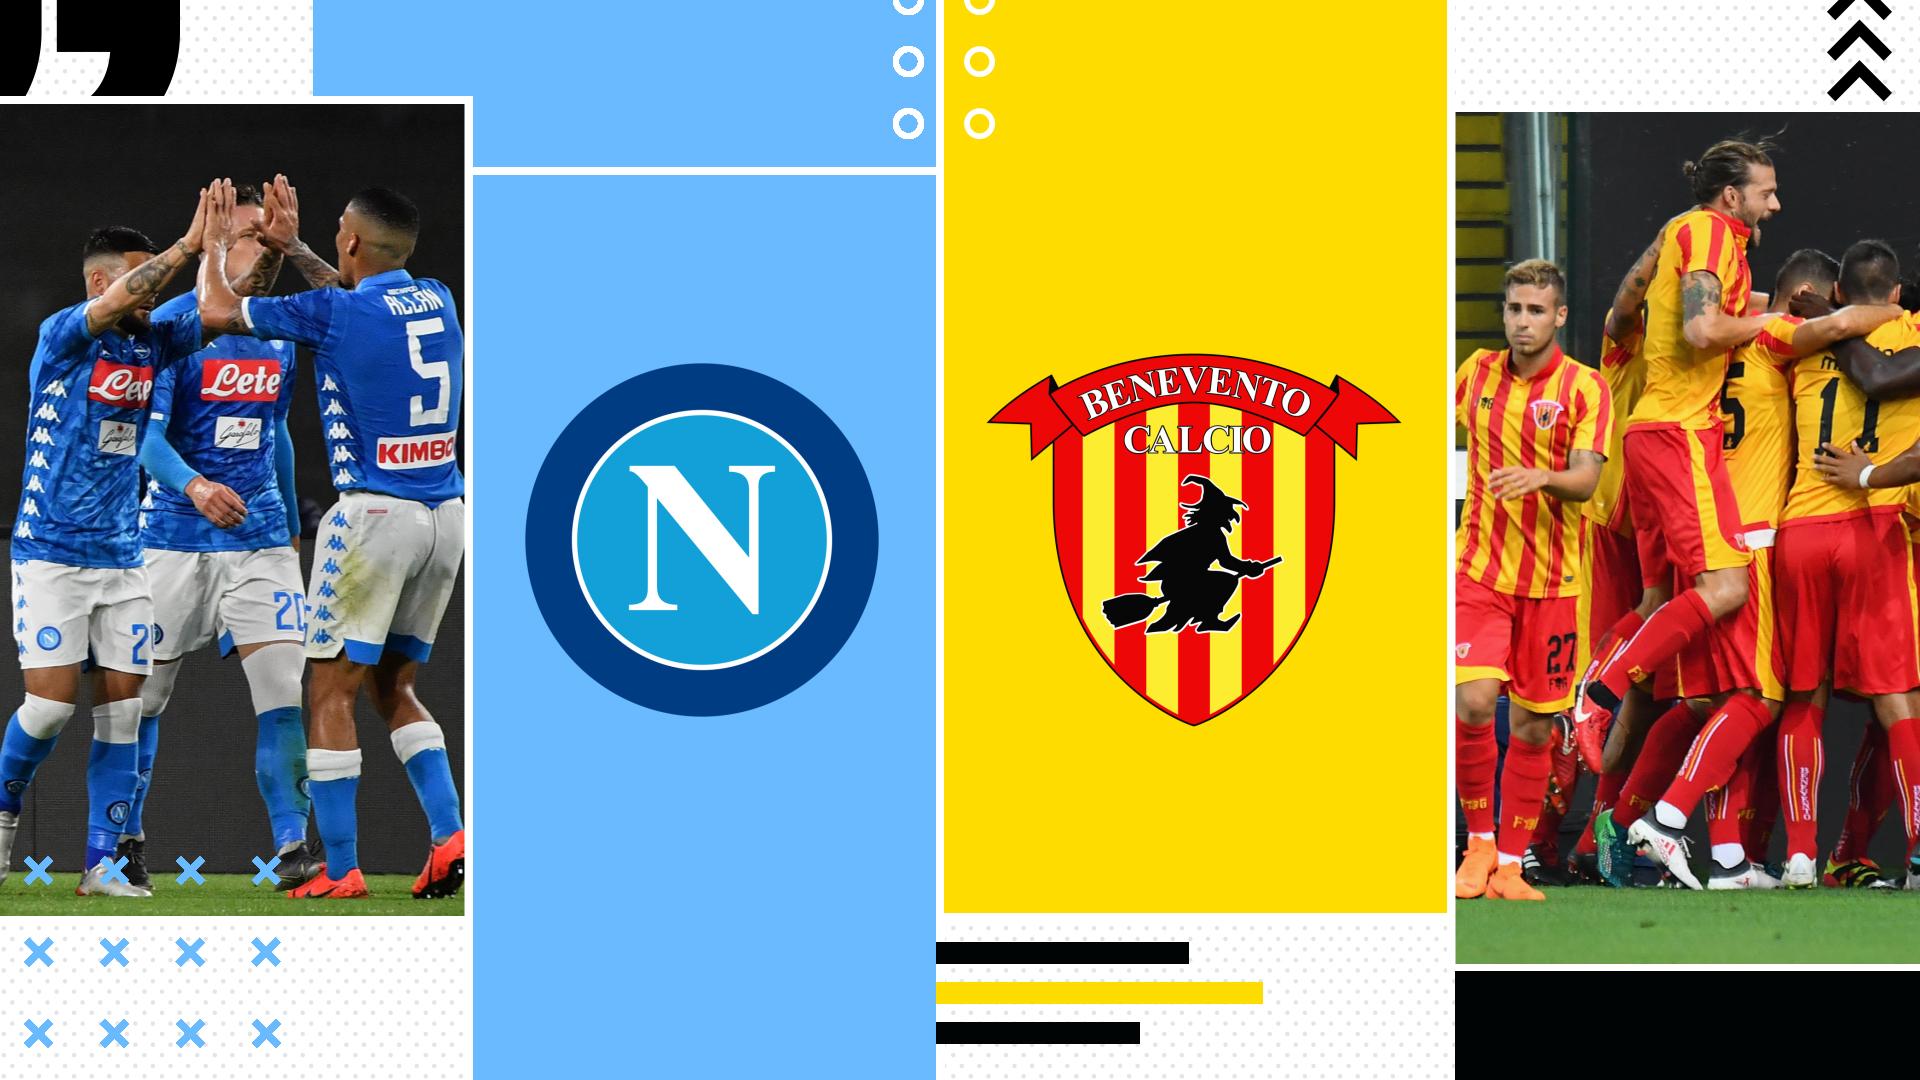 Napoli-Benevento tv streaming